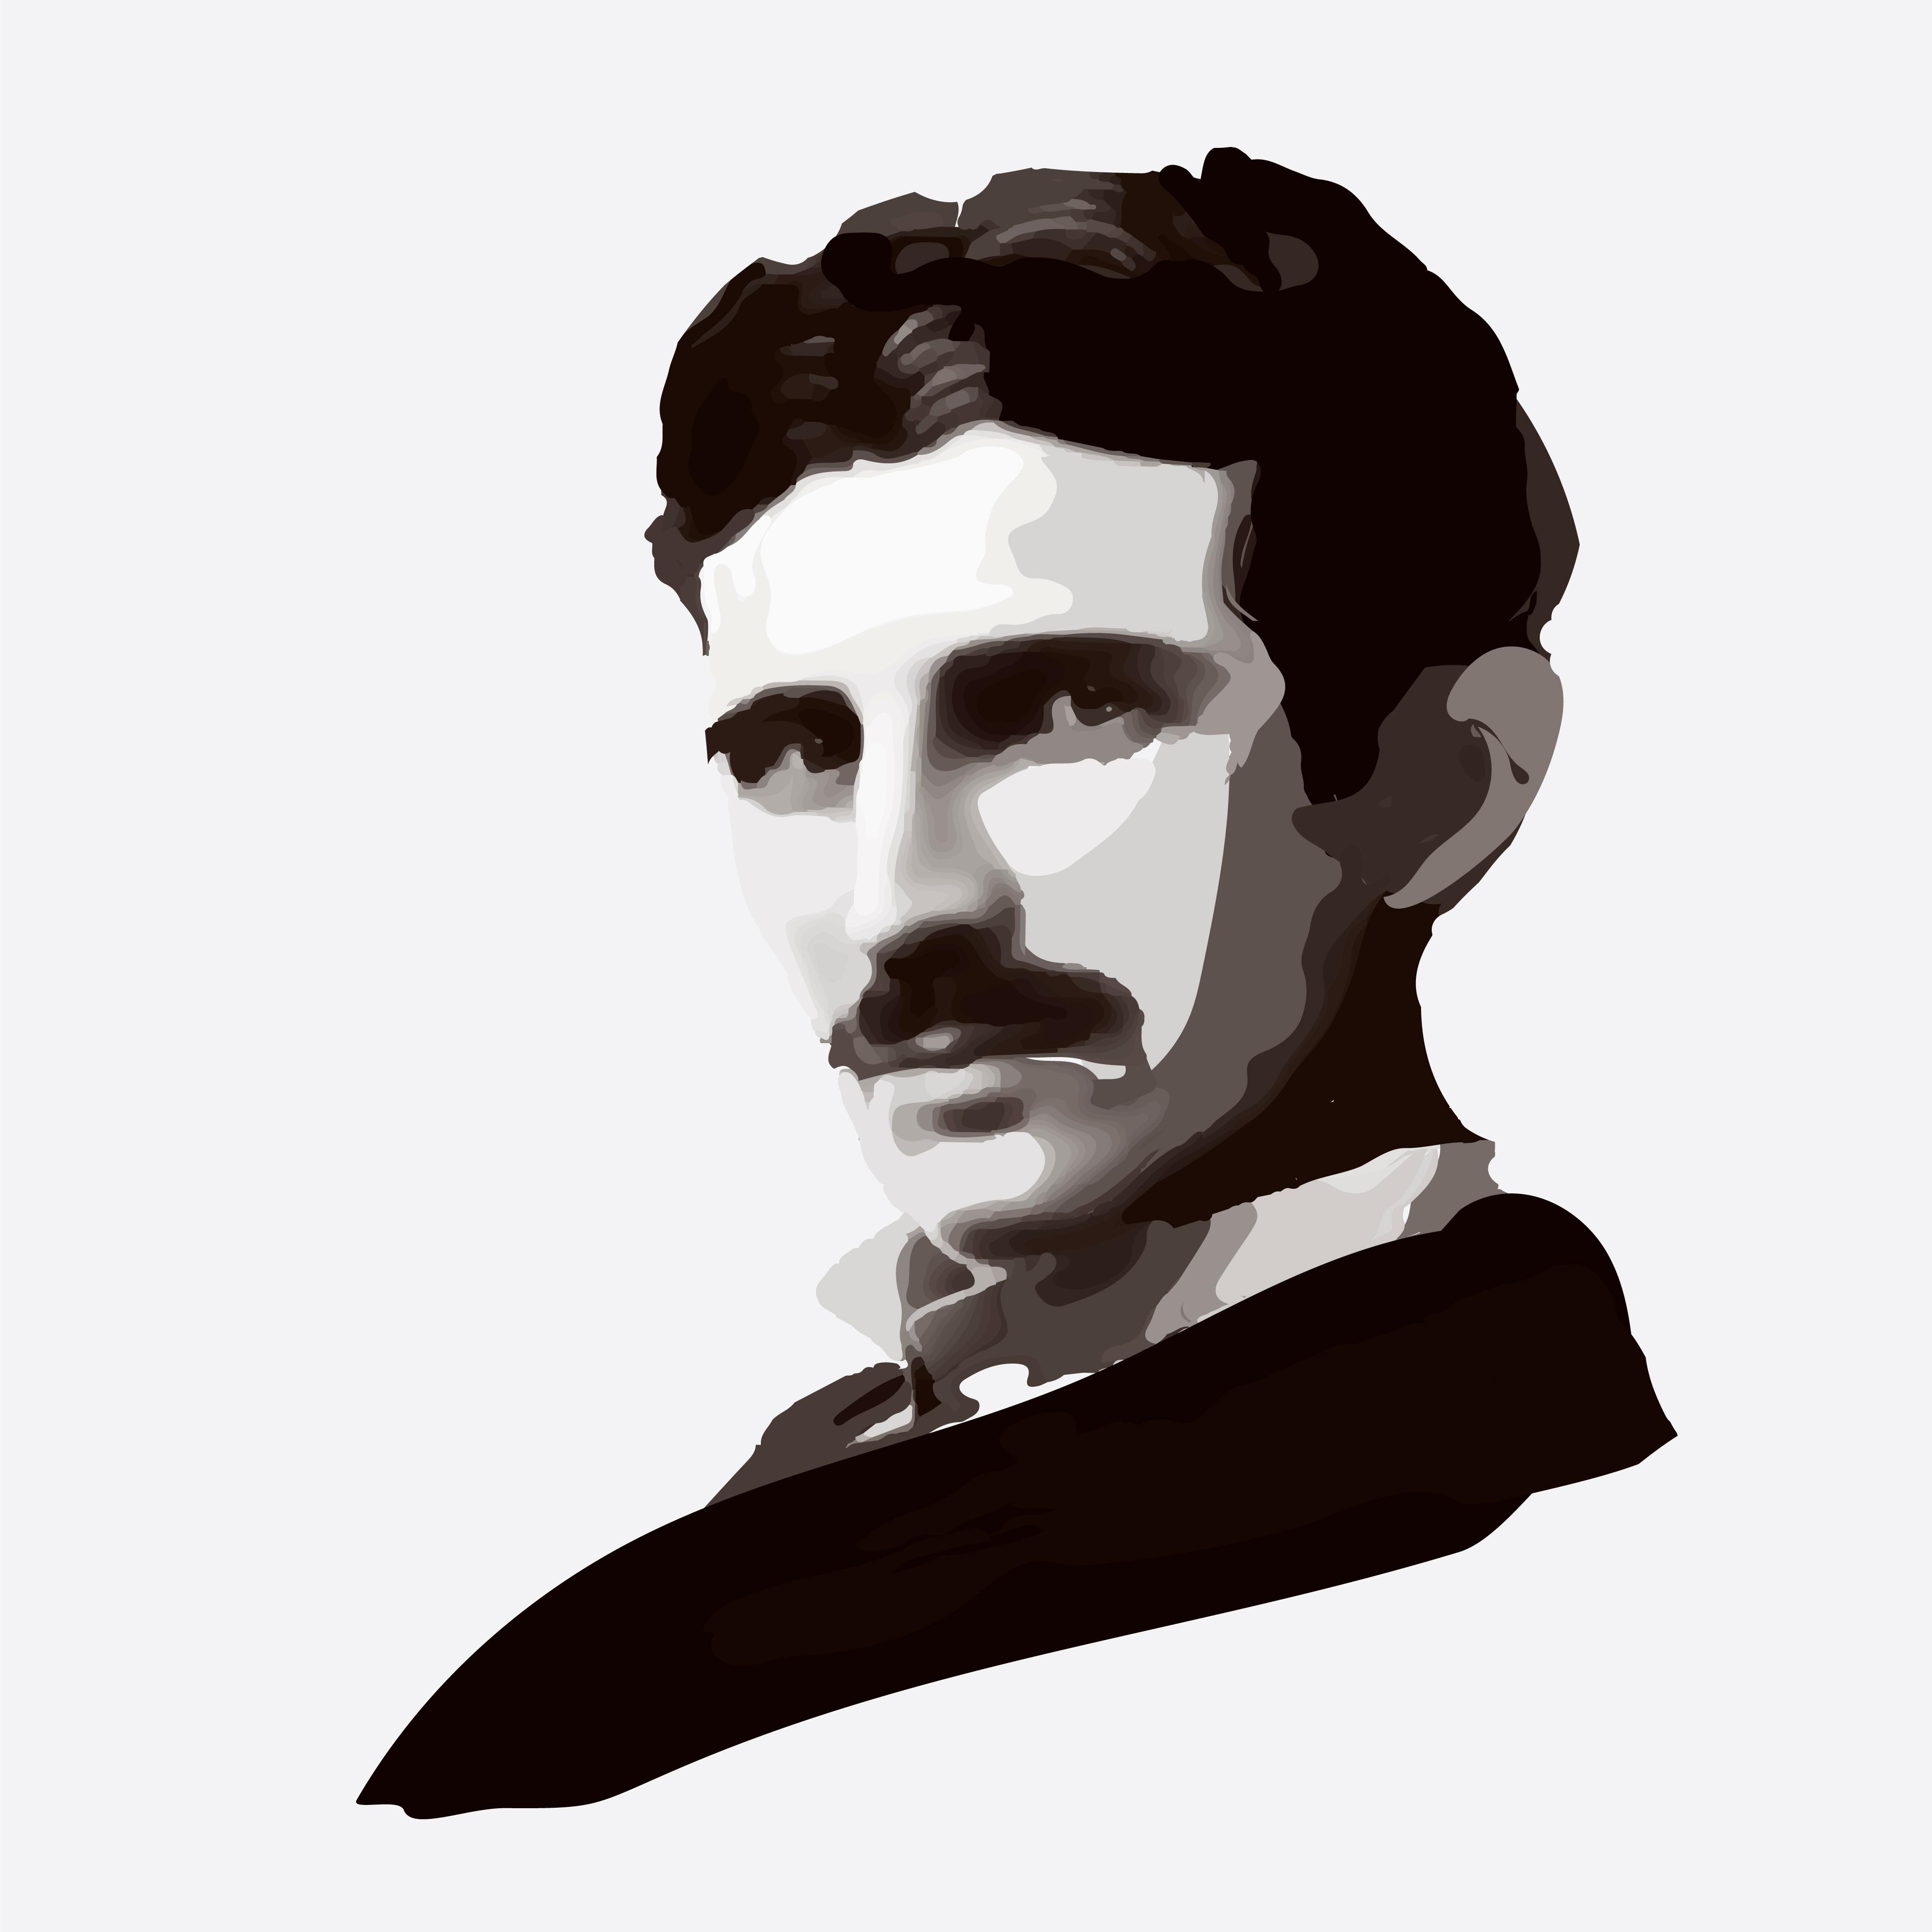 Nikola Tesla Image